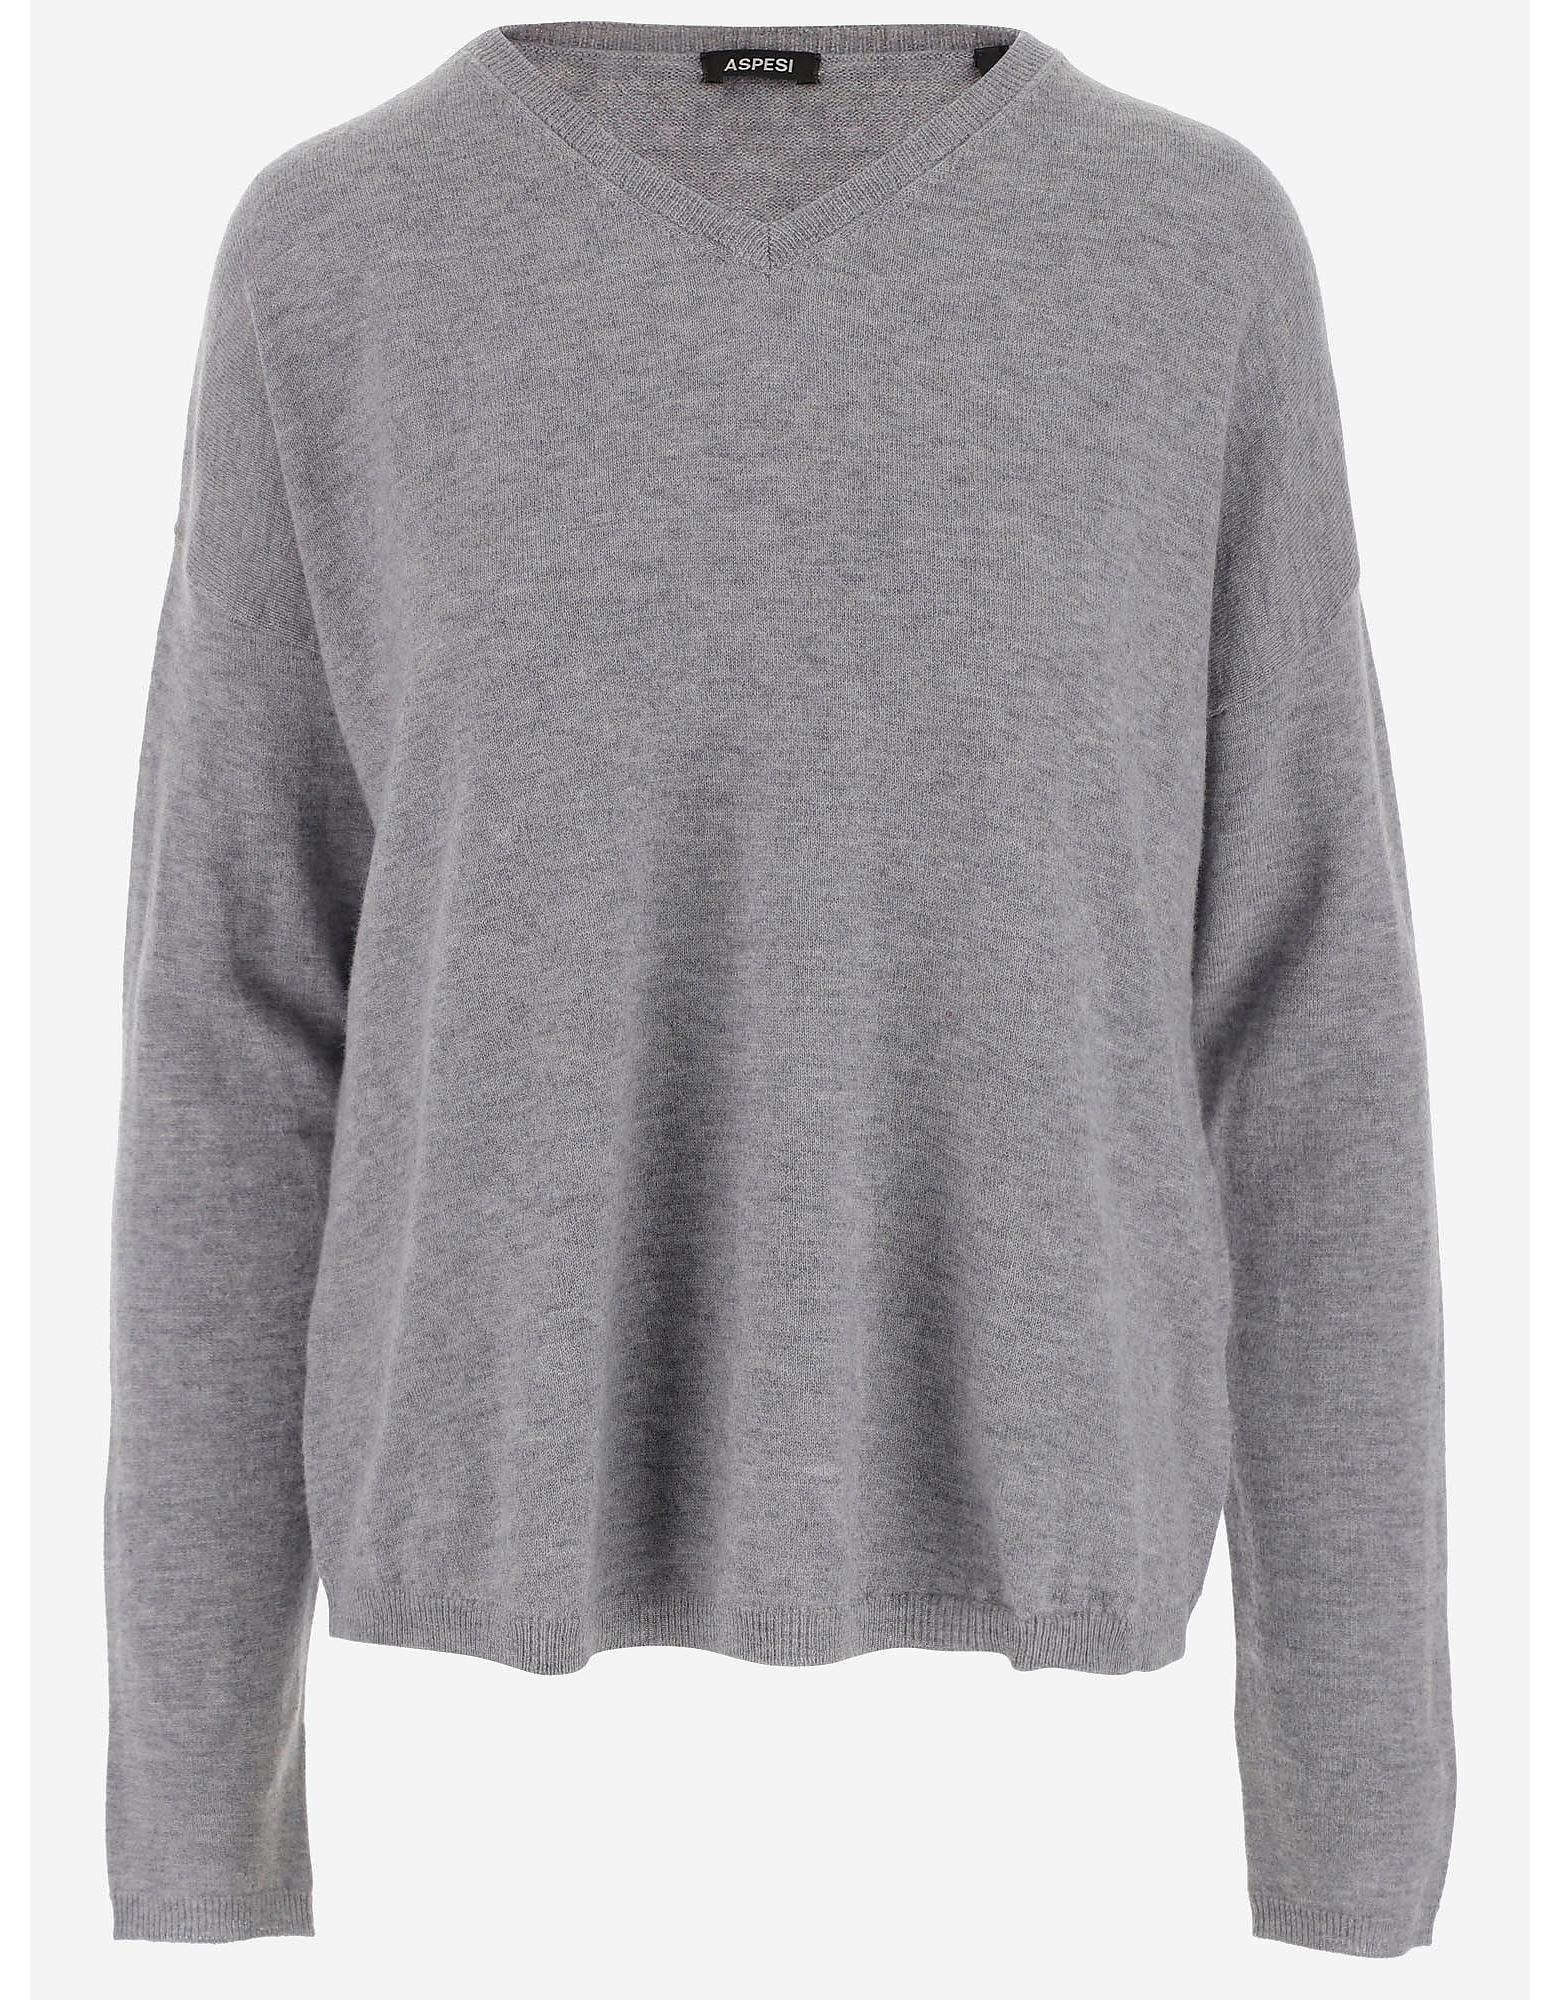 Aspesi Designer Knitwear, Women's Crewneck Sweater